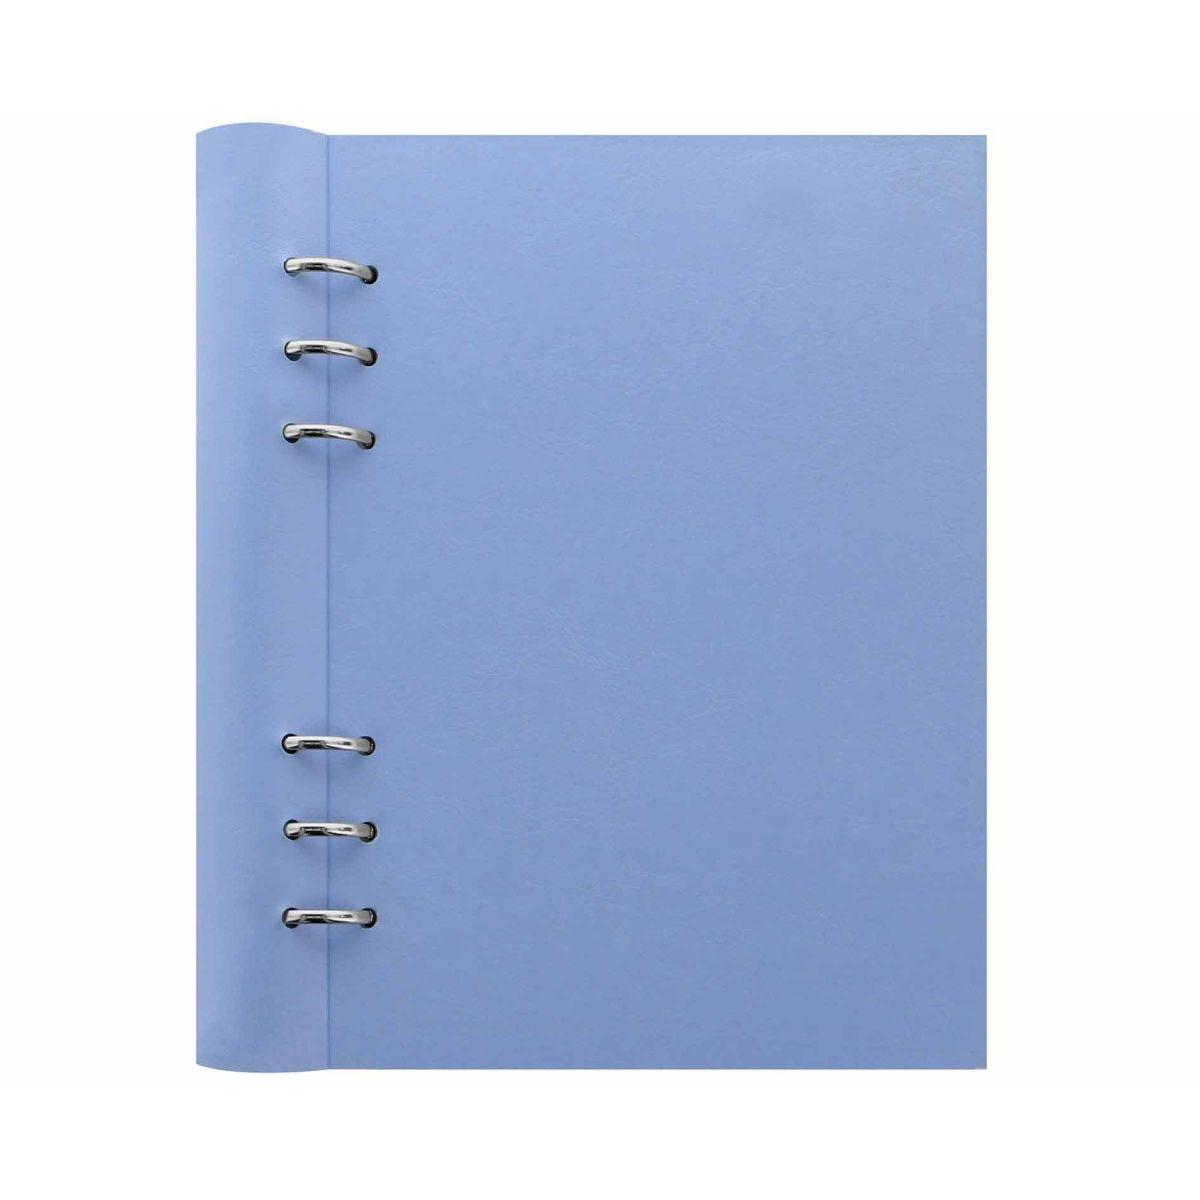 Filofax Refillable Clipbook Planner A5 Blue